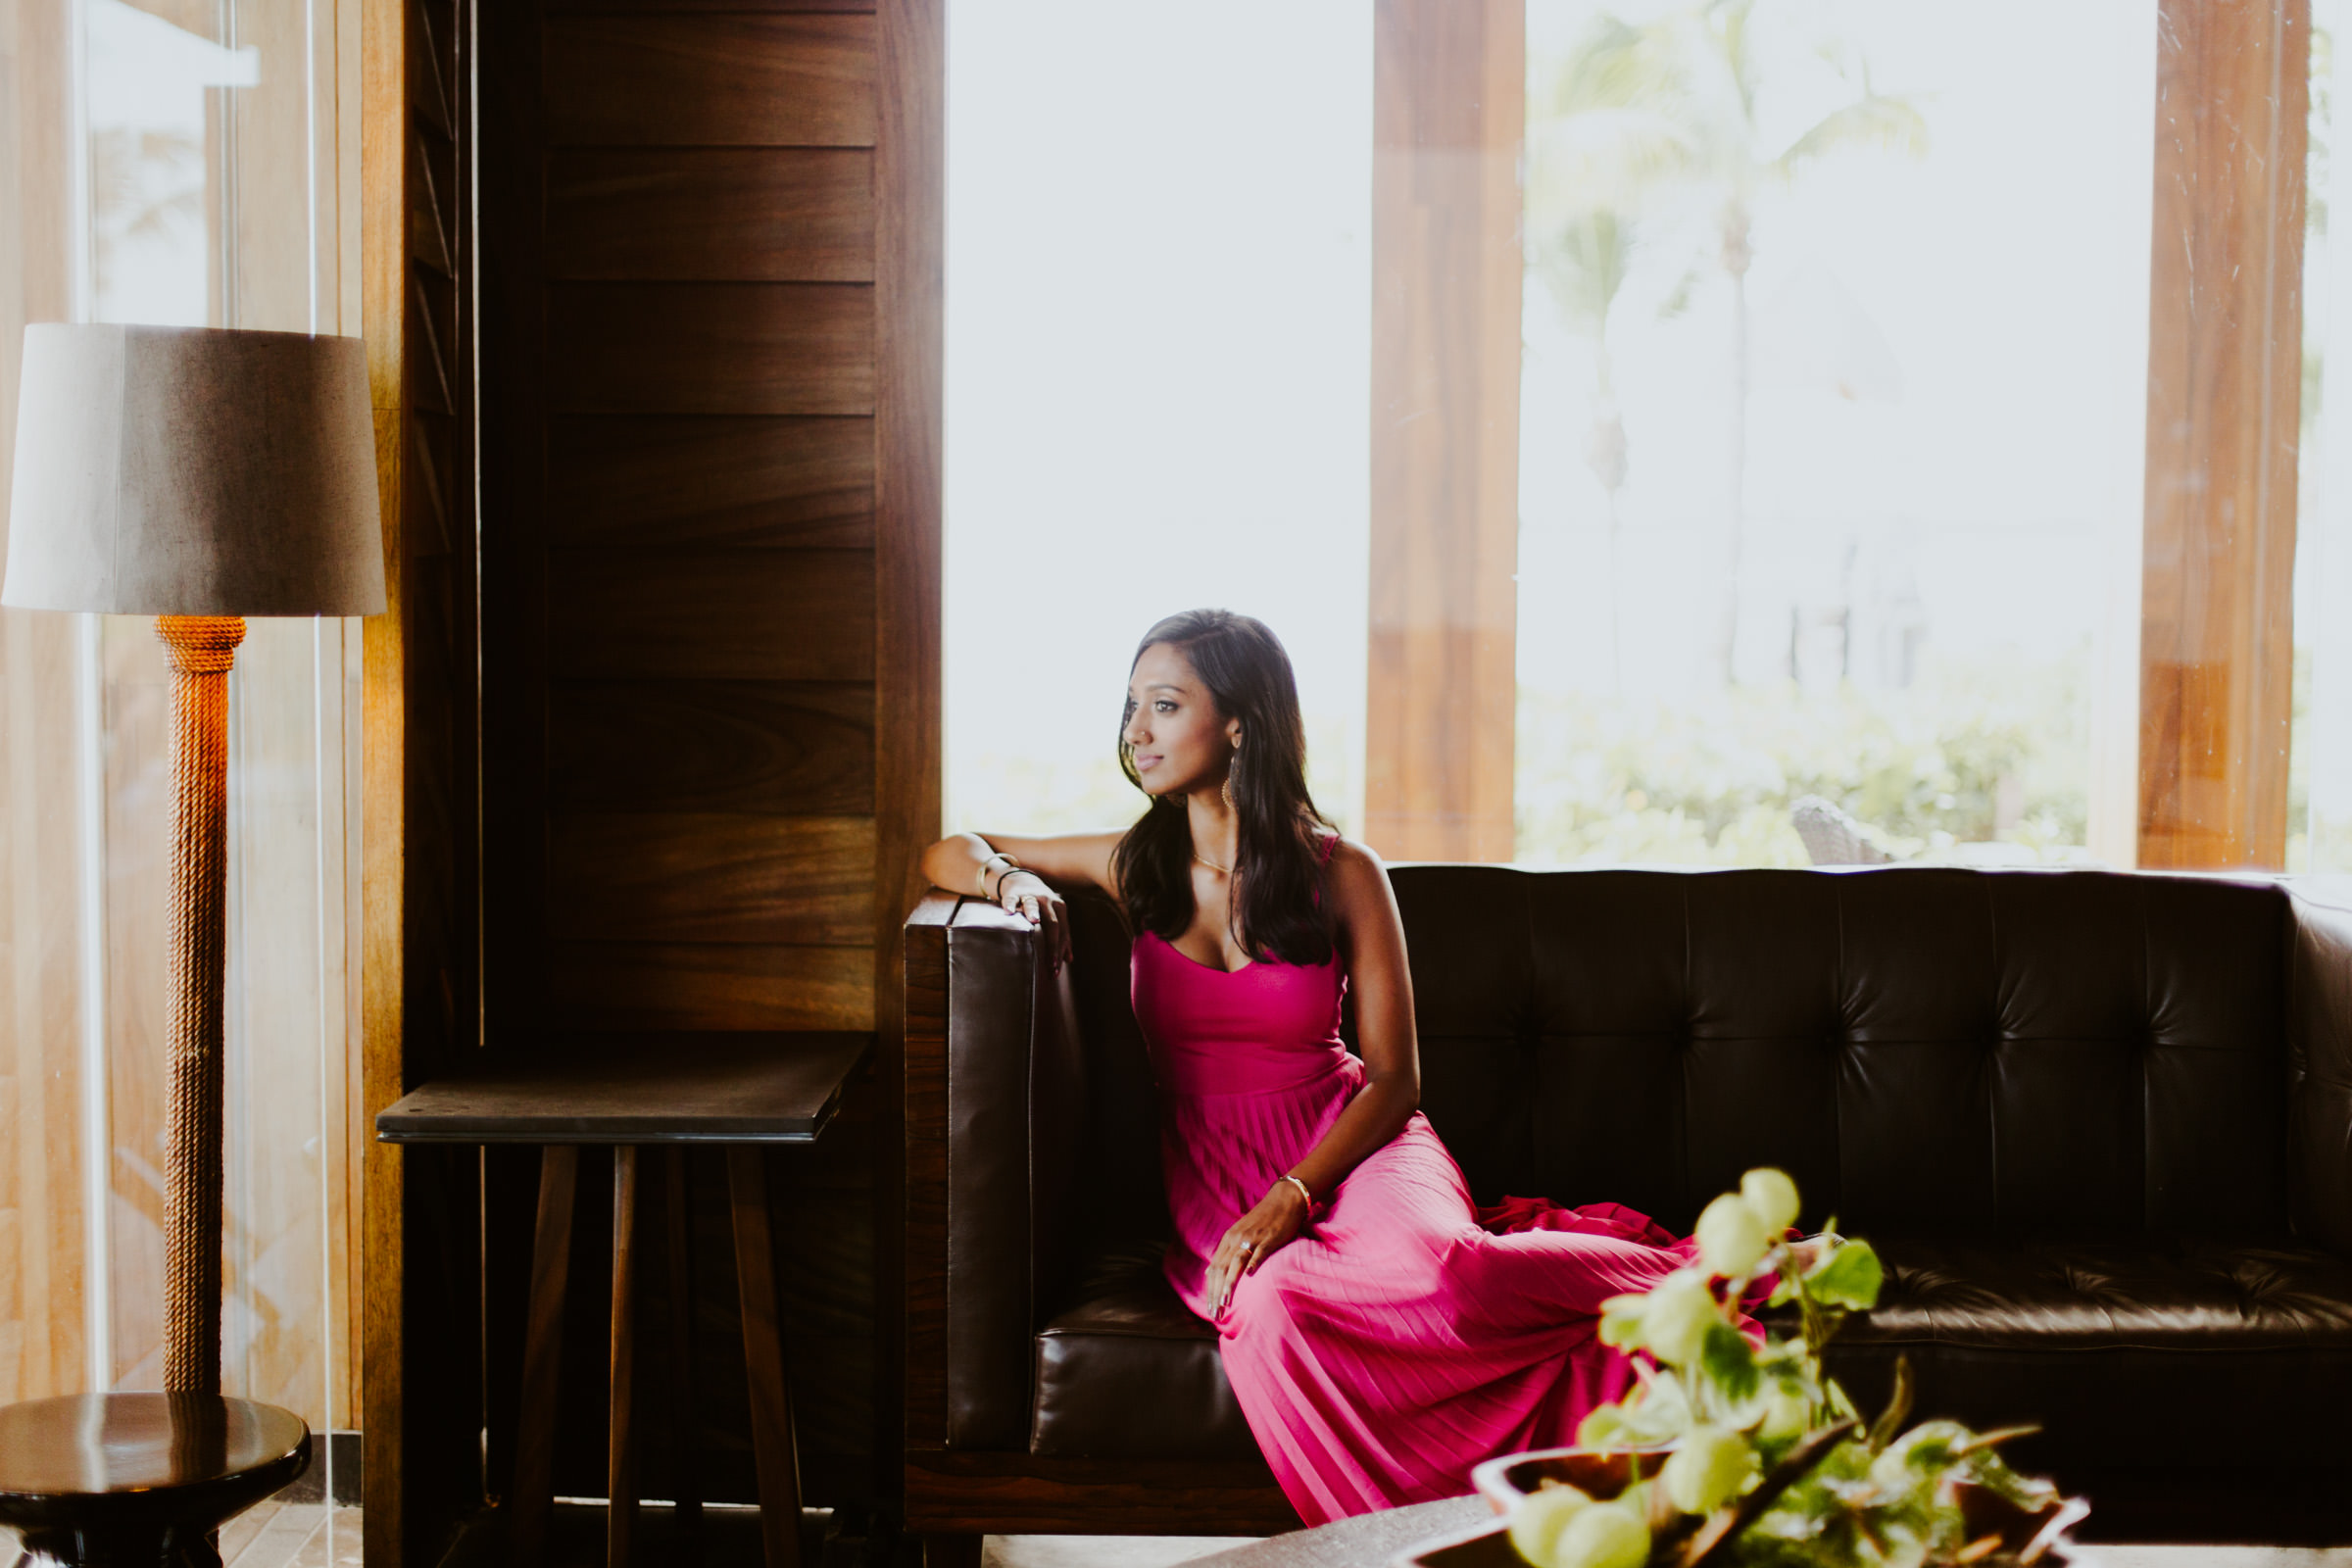 Engagement-Session-Nizuc-Resort-Spa-Indian-Wedding-Cancun-Mexico-Pierce--14.jpg